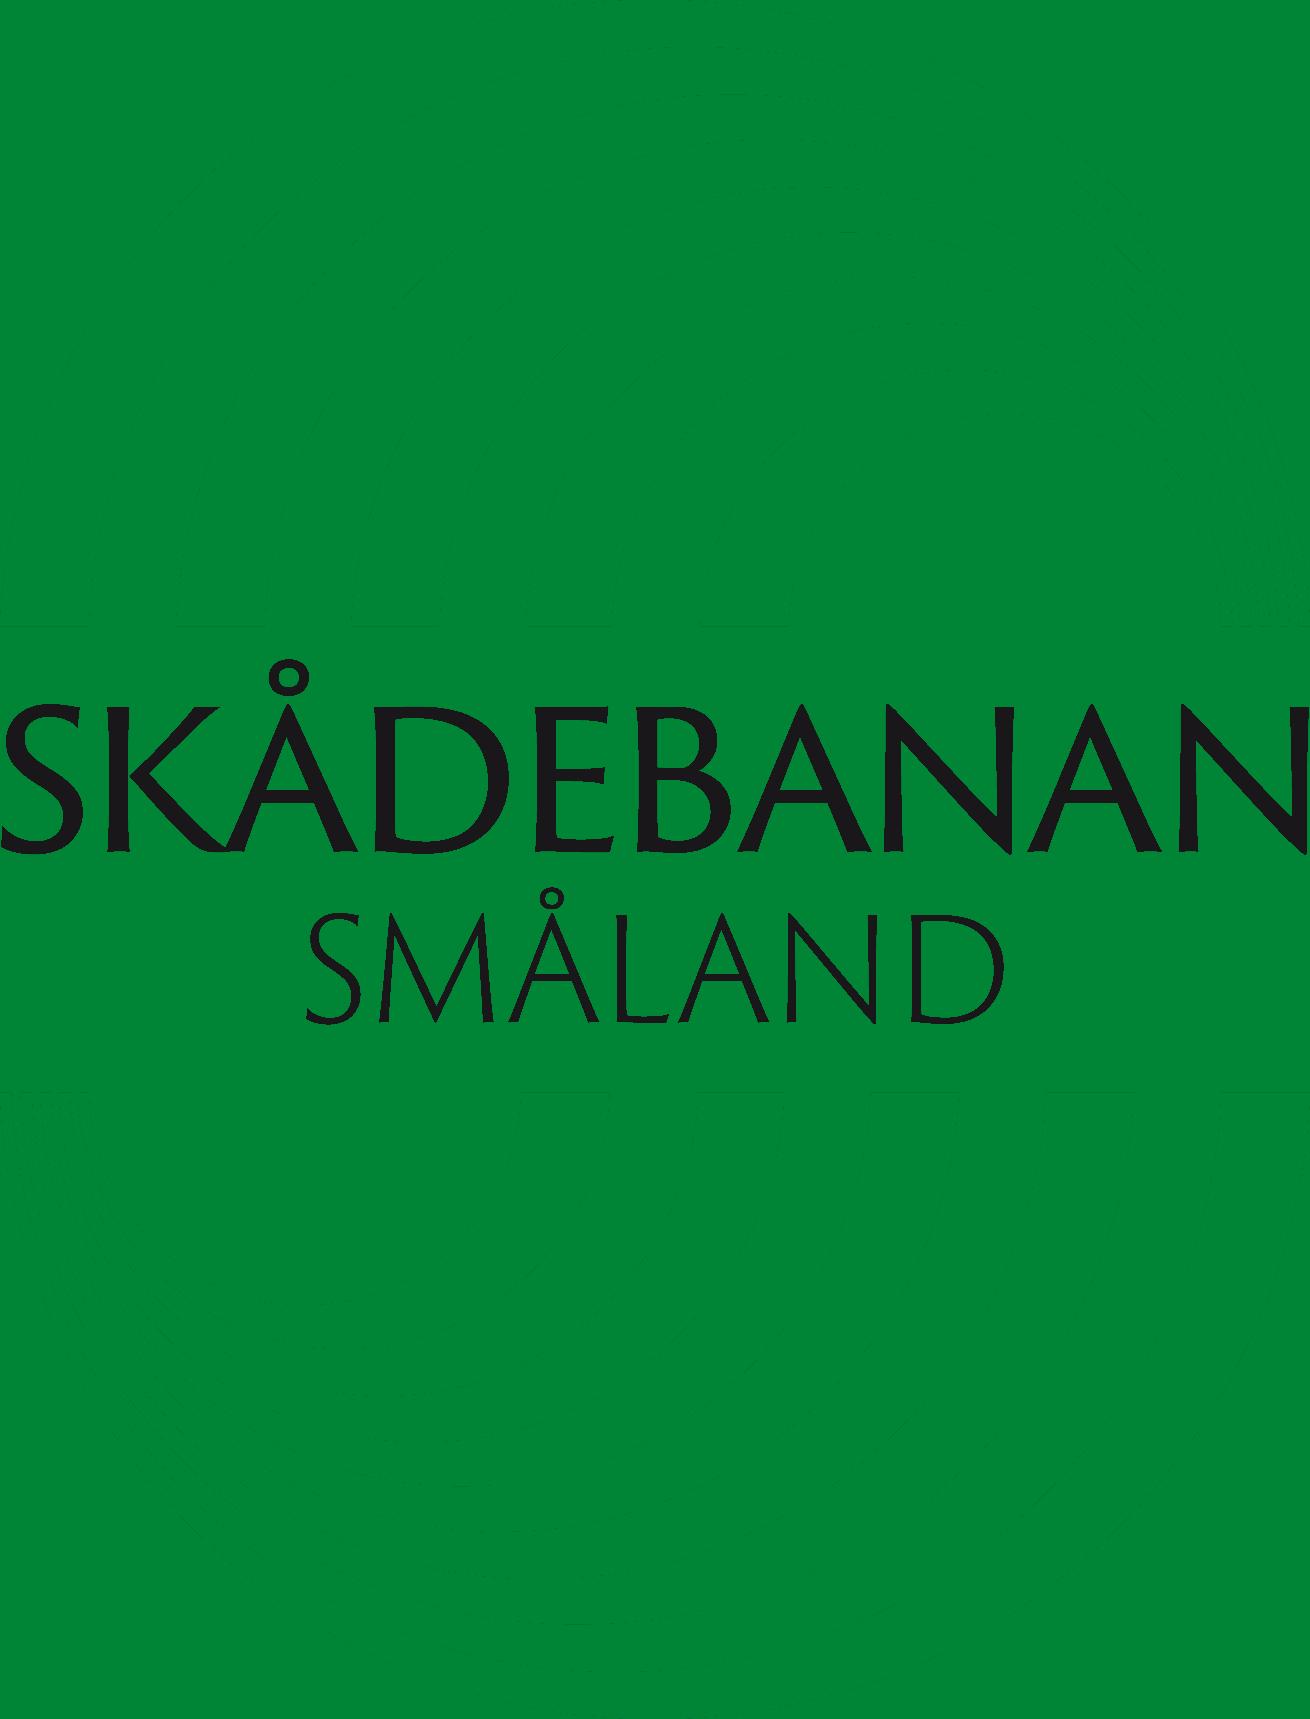 Skådebanan Småland